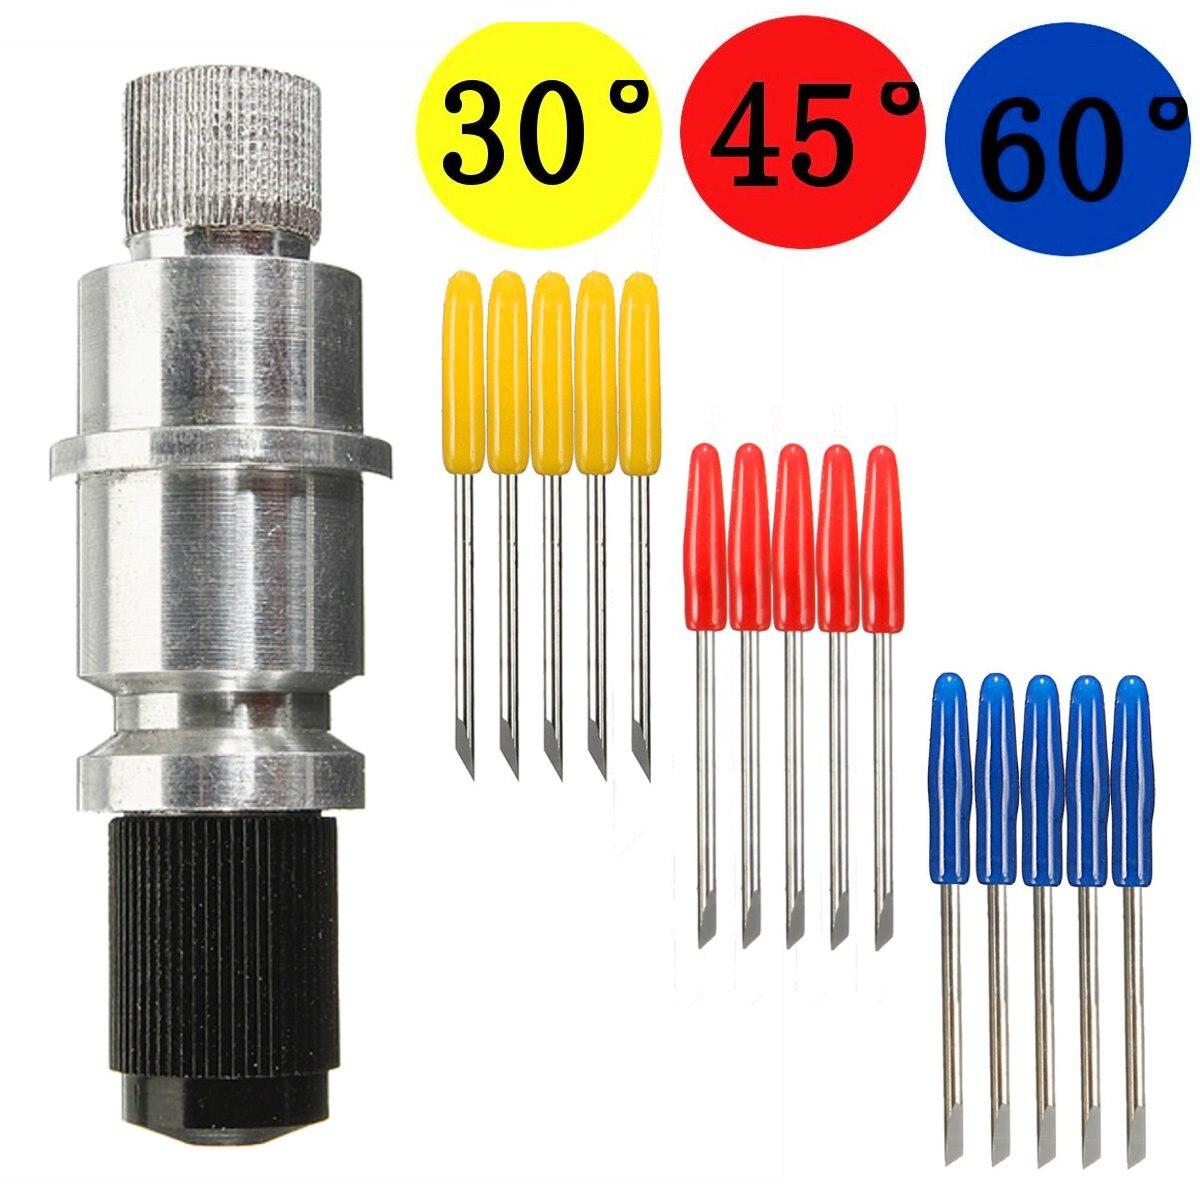 New 5pcs 30/45/ 60 Degree Vinyl Cutter Plotter Blades + Blade Holder For Graphtec CB09 Tungsten Steel Milling Cutter